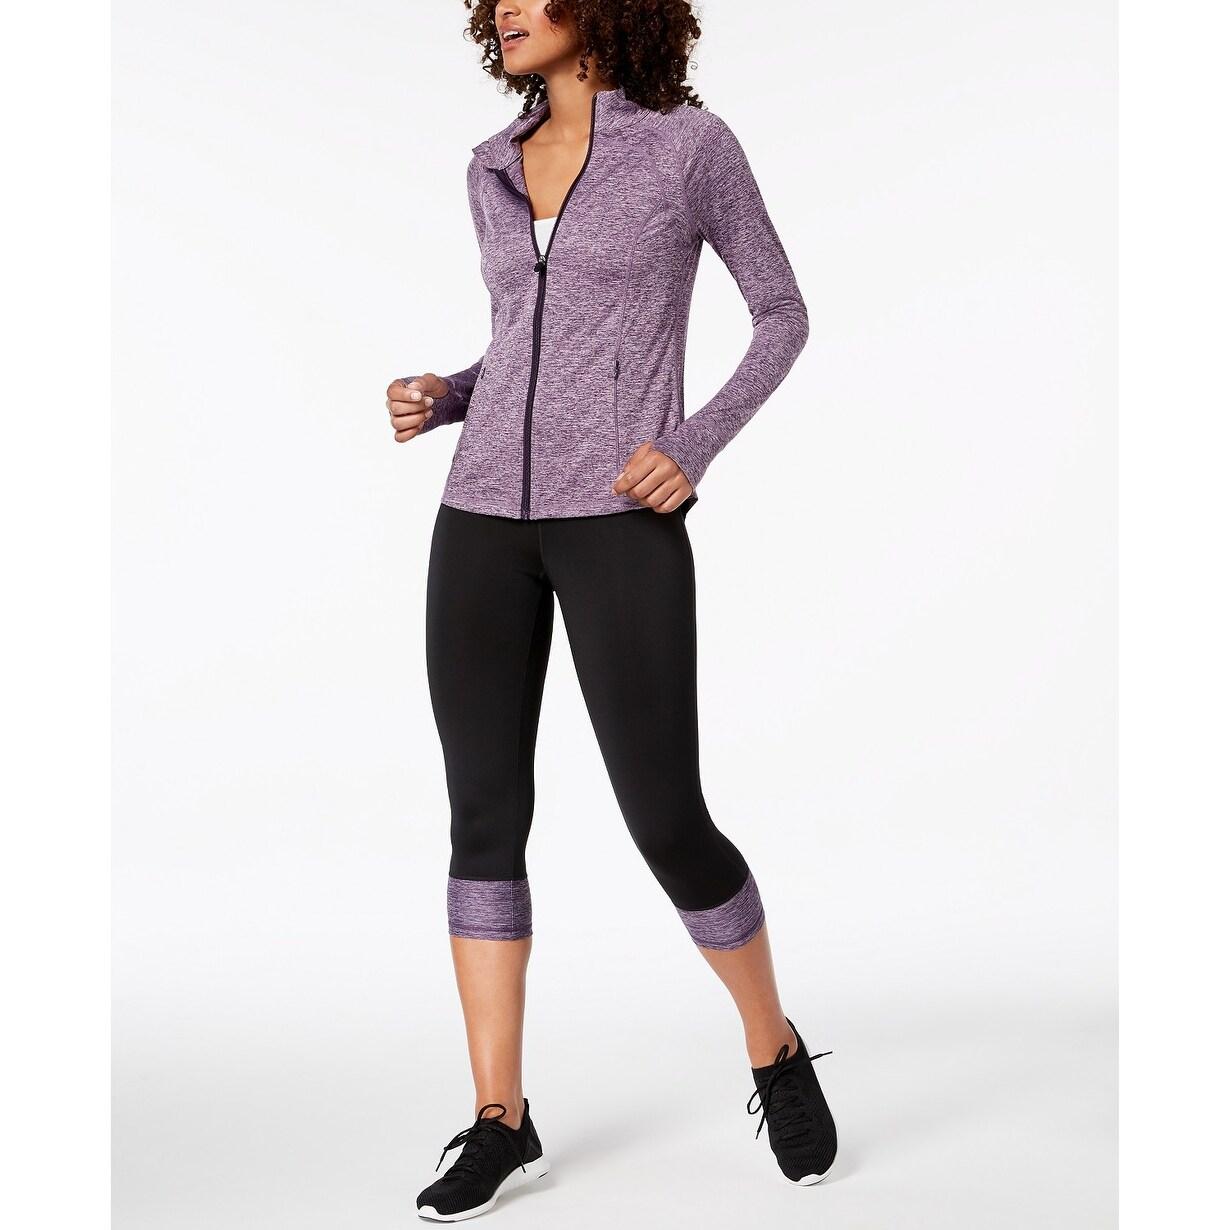 5c6cff2aeafc8f Shop Ideology Women's Rapidry Colorblocked Capri Leggings Purple Medium - M  (8 - 10) - On Sale - Free Shipping On Orders Over $45 - Overstock - 24303114